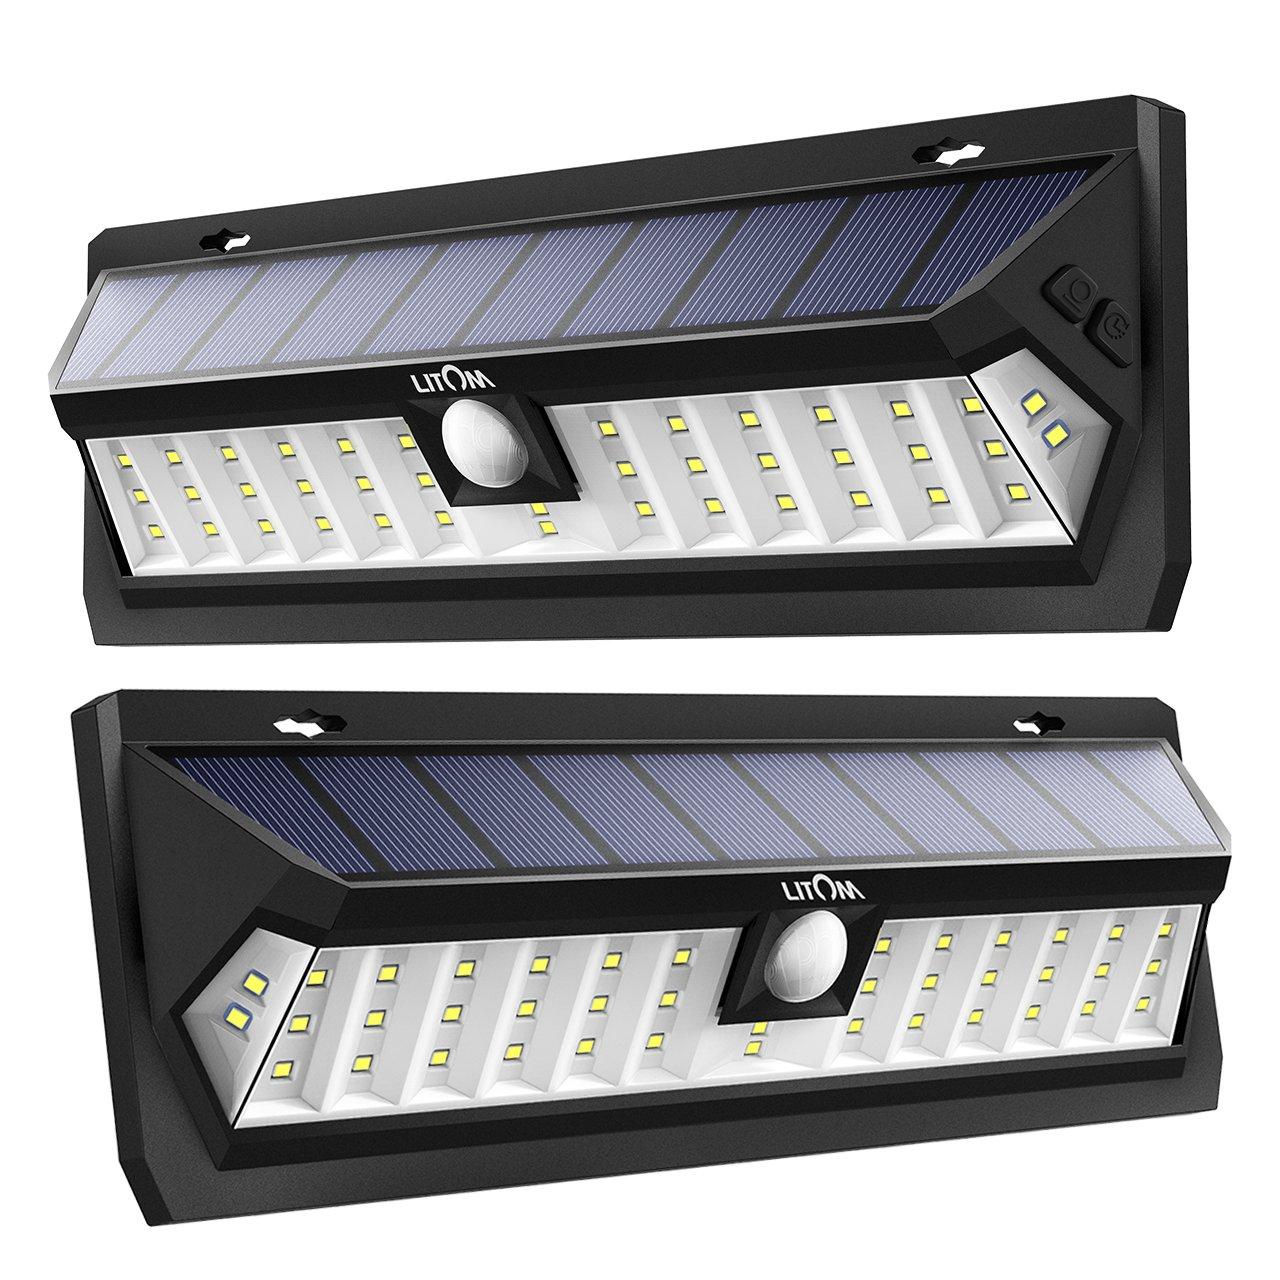 LITOM Solar Lights Outdoor 42 LED, Adjustable Lighting Time Solar Motion Sensor Light with 270° Wide Angle and Waterproof Design, Wireless Solar Lighting for Front Door, Yard, Garage, Deck (2 Pack) by Litom (Image #1)